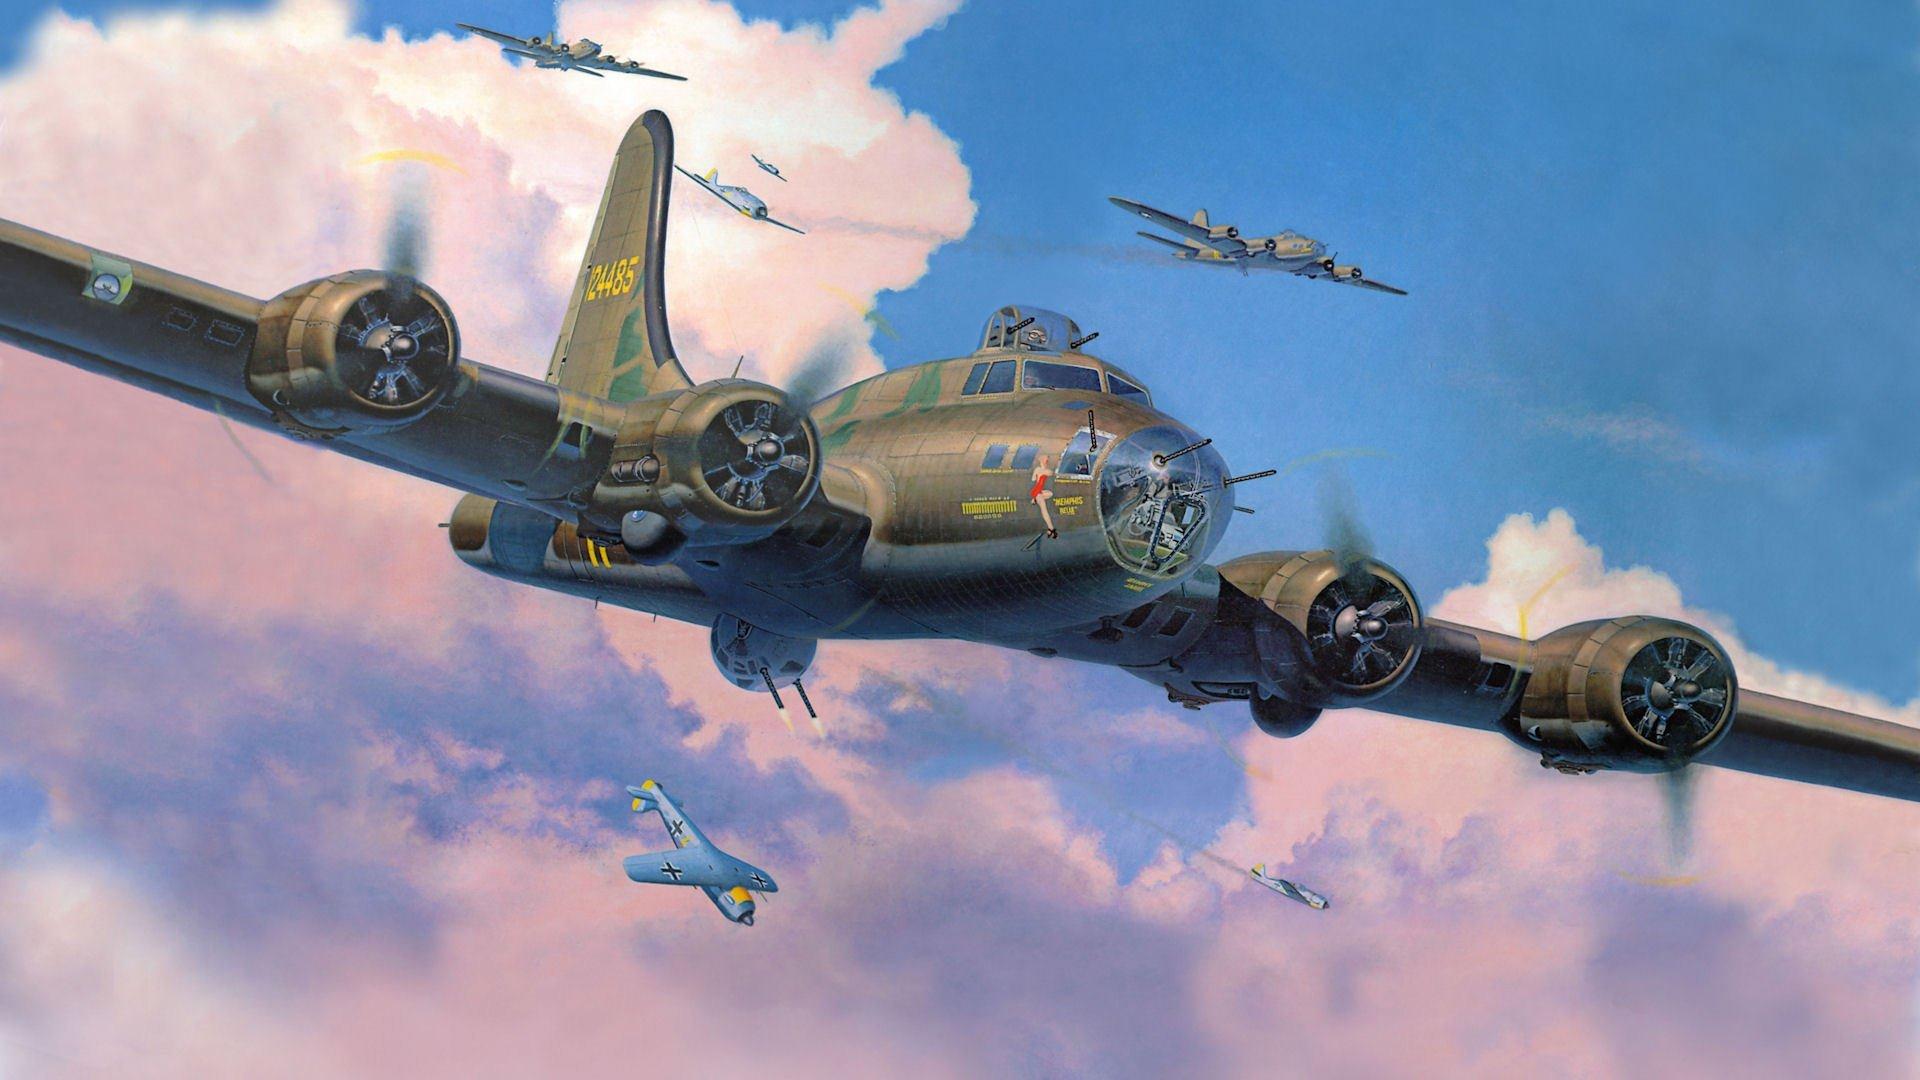 Boeing B 17 Flying Fortress Wallpaper 21   1920 X 1080 stmednet 1920x1080